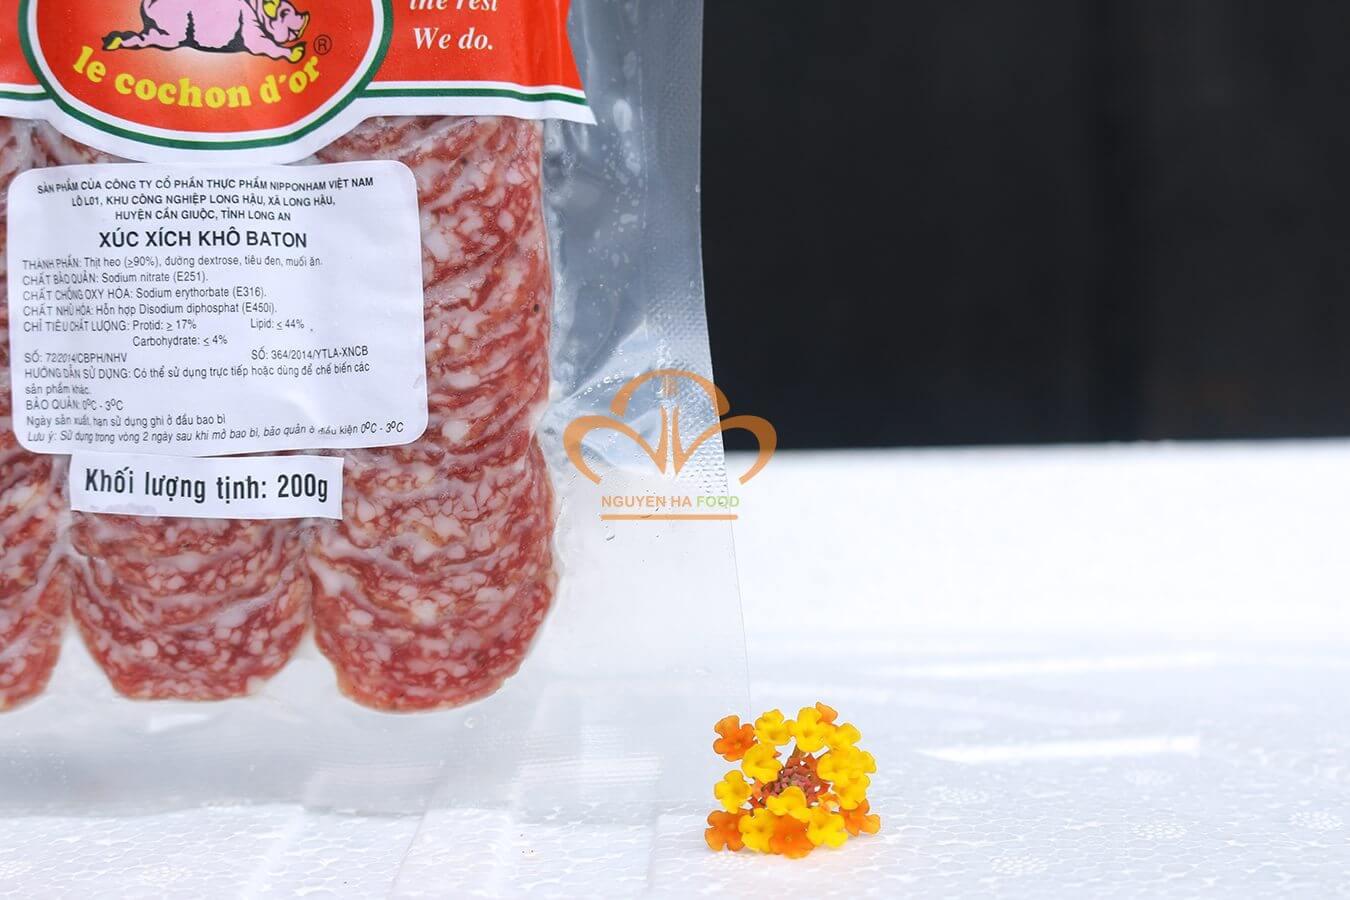 xuc-xich-kho-cat-lat-salami-baton-salami-stick-sliced-3